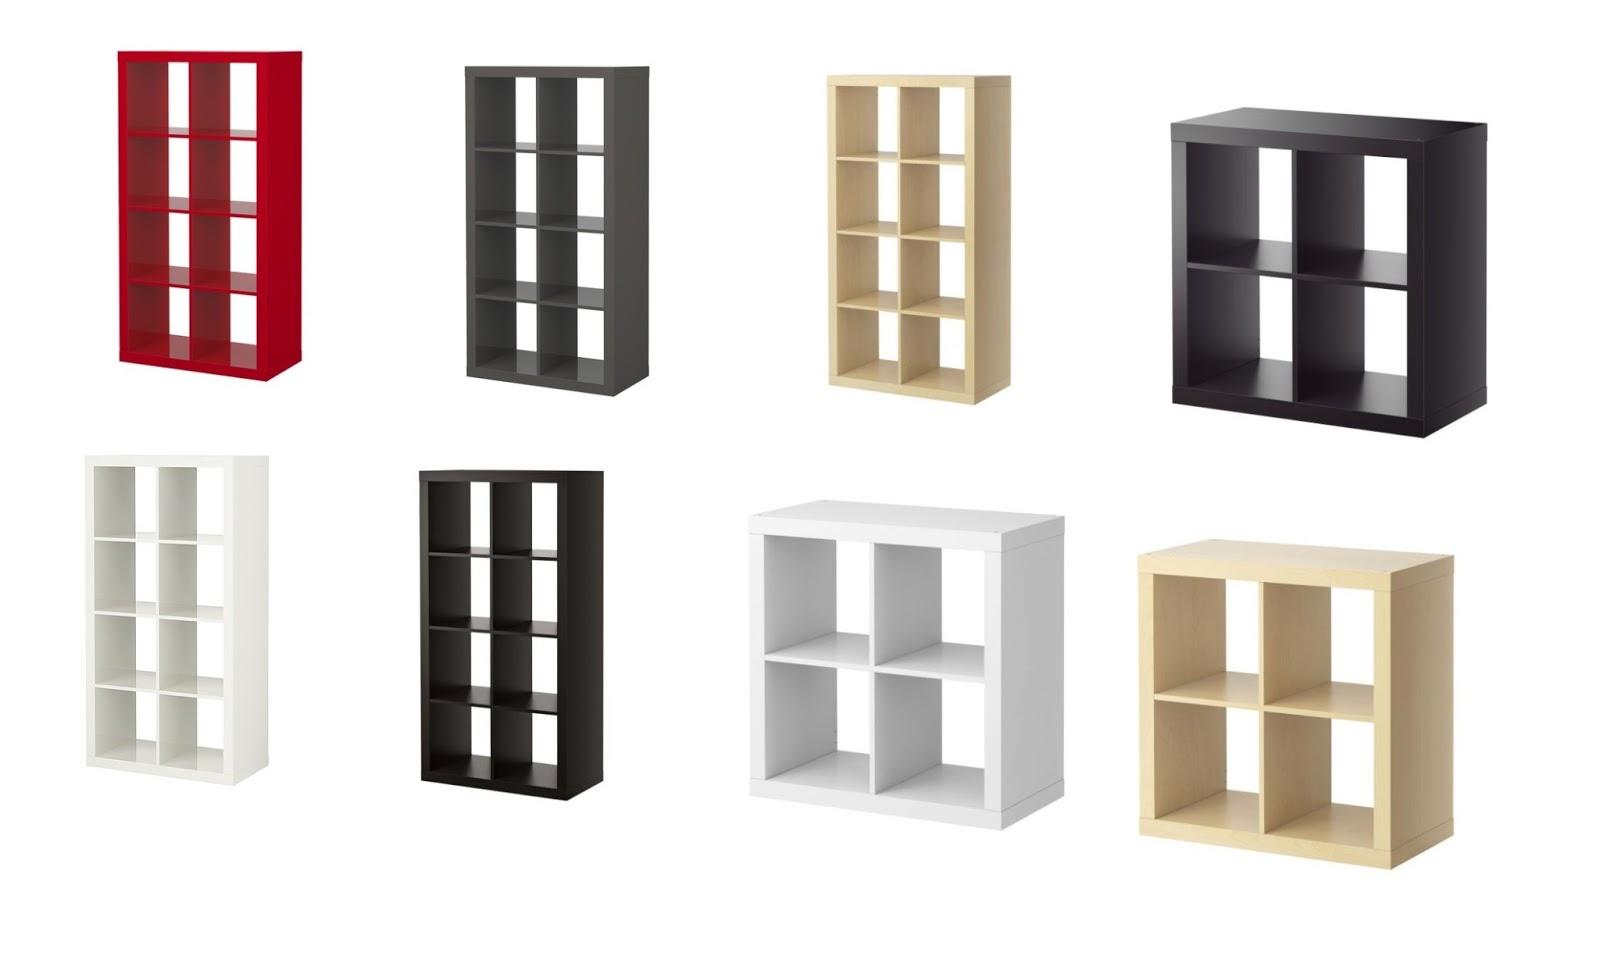 Viaje al fin del ikea hyperbole - Ikea muebles auxiliares de bano ...